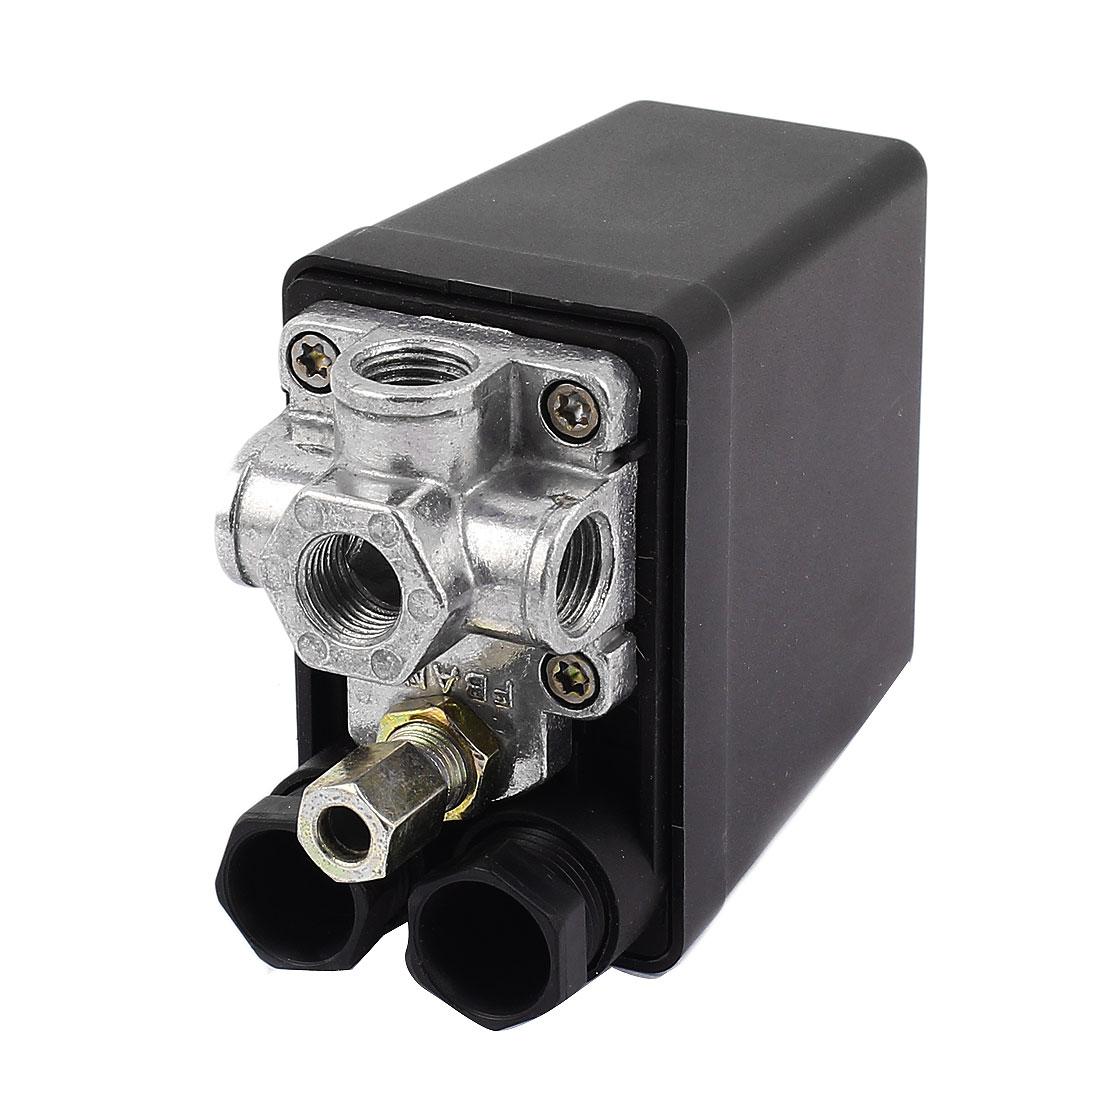 AC 240V 1/4BSP 4 Port 1.2Map 175PSI Air Compressor Pressure Switch Control Valve